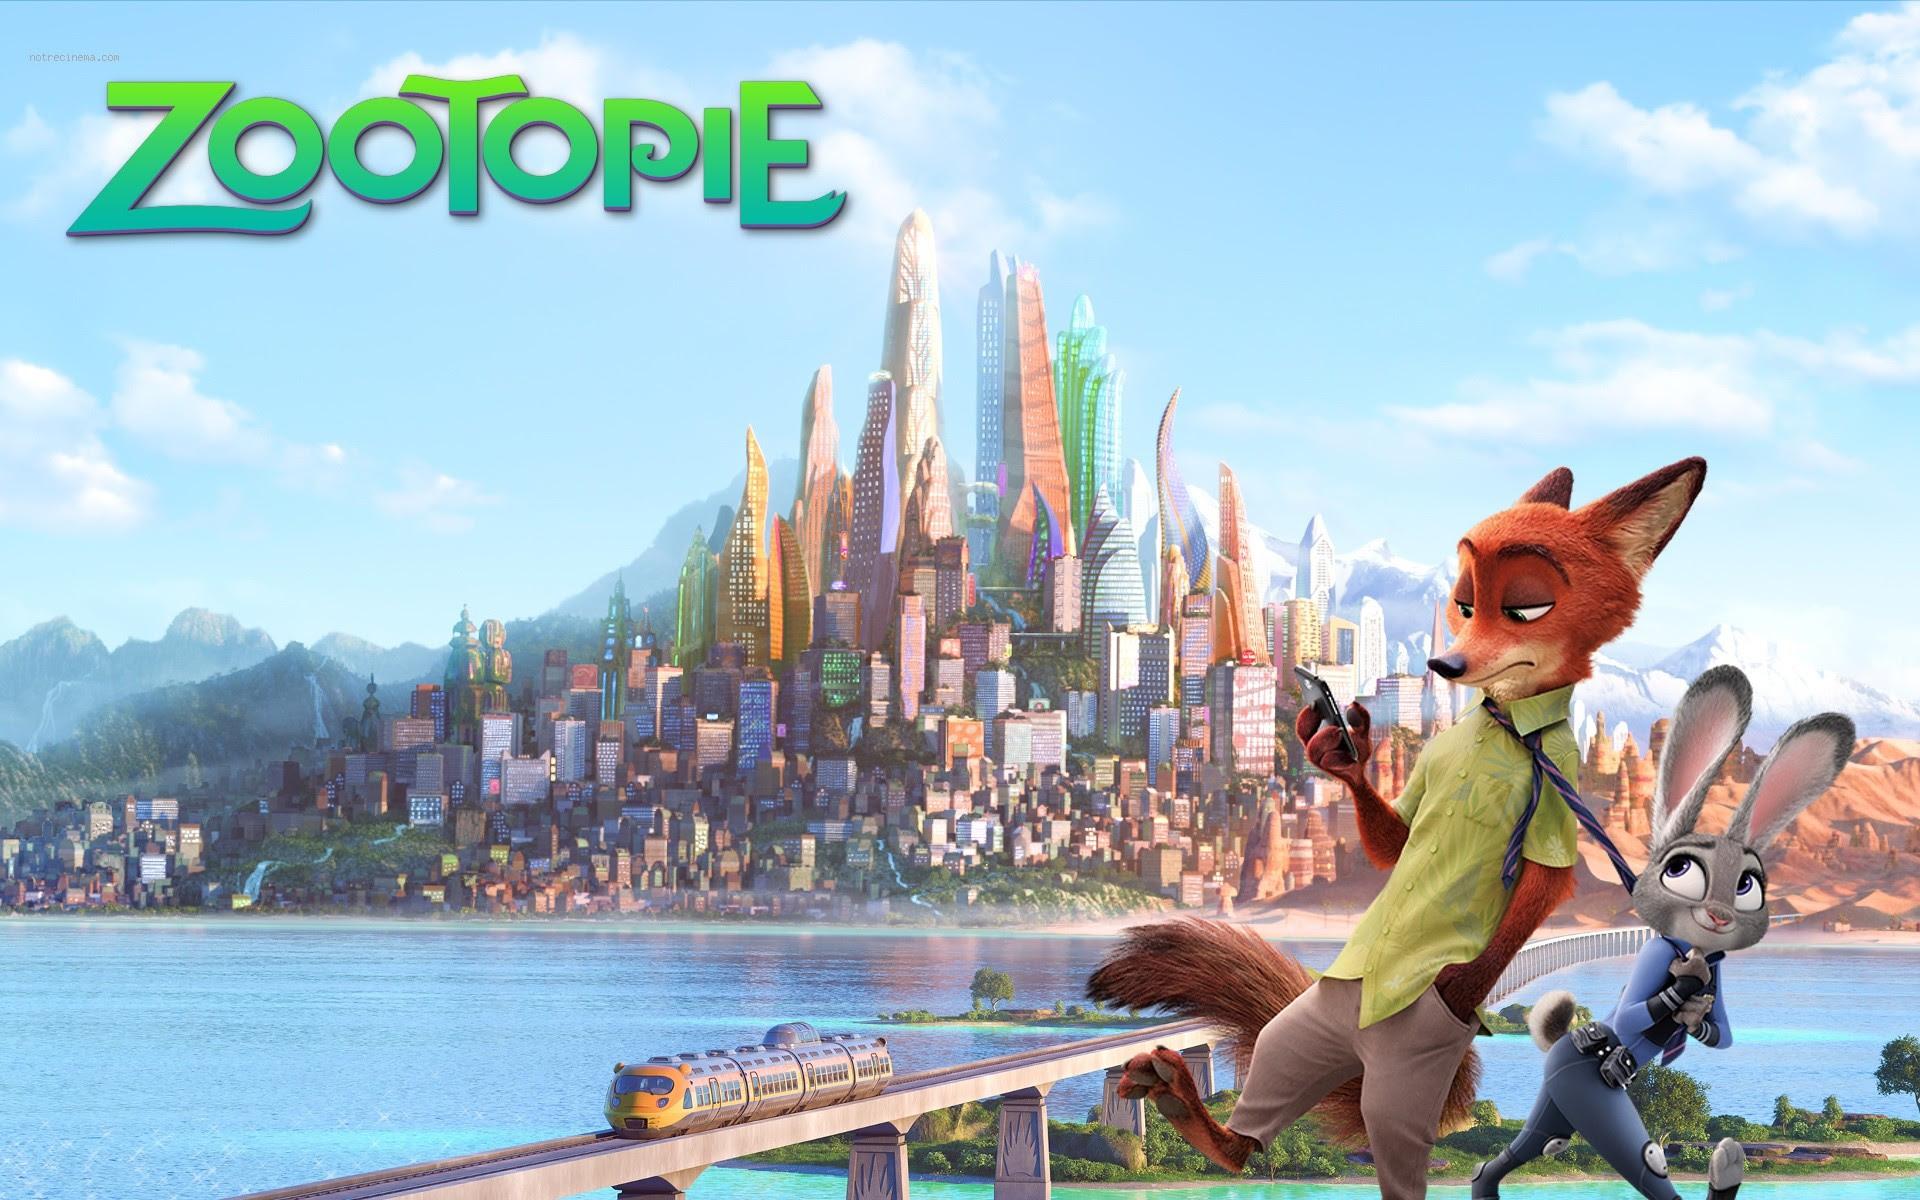 Zootopia iPhone Wallpaper (73+ images)